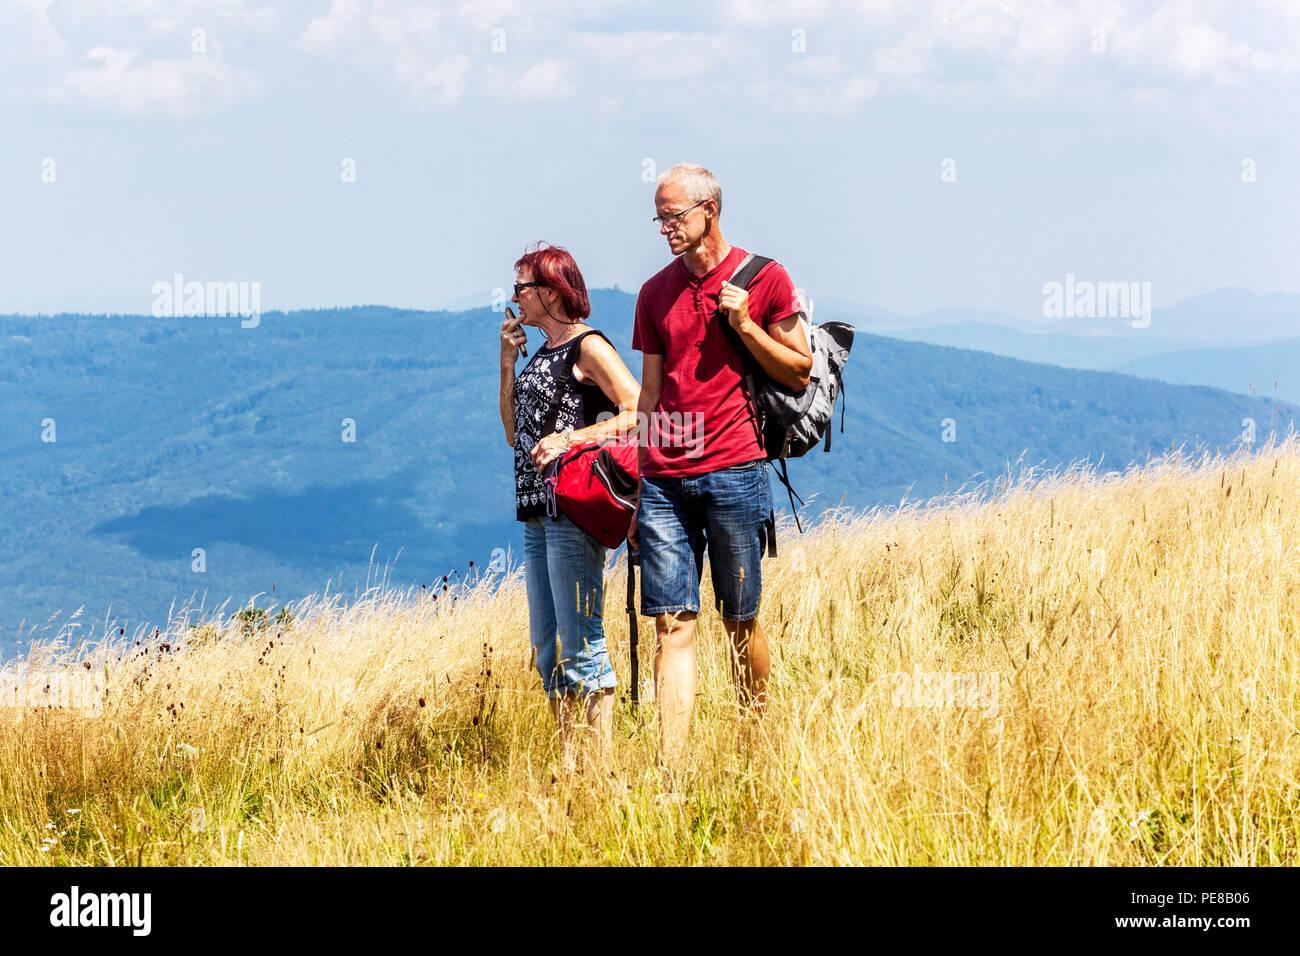 Active aging, Seniors hiking on a mountain meadow, Bile Karpaty Mountains, White Carpathians, Czech Slovakian border, Czech Republic, Slovakia - Stock Image